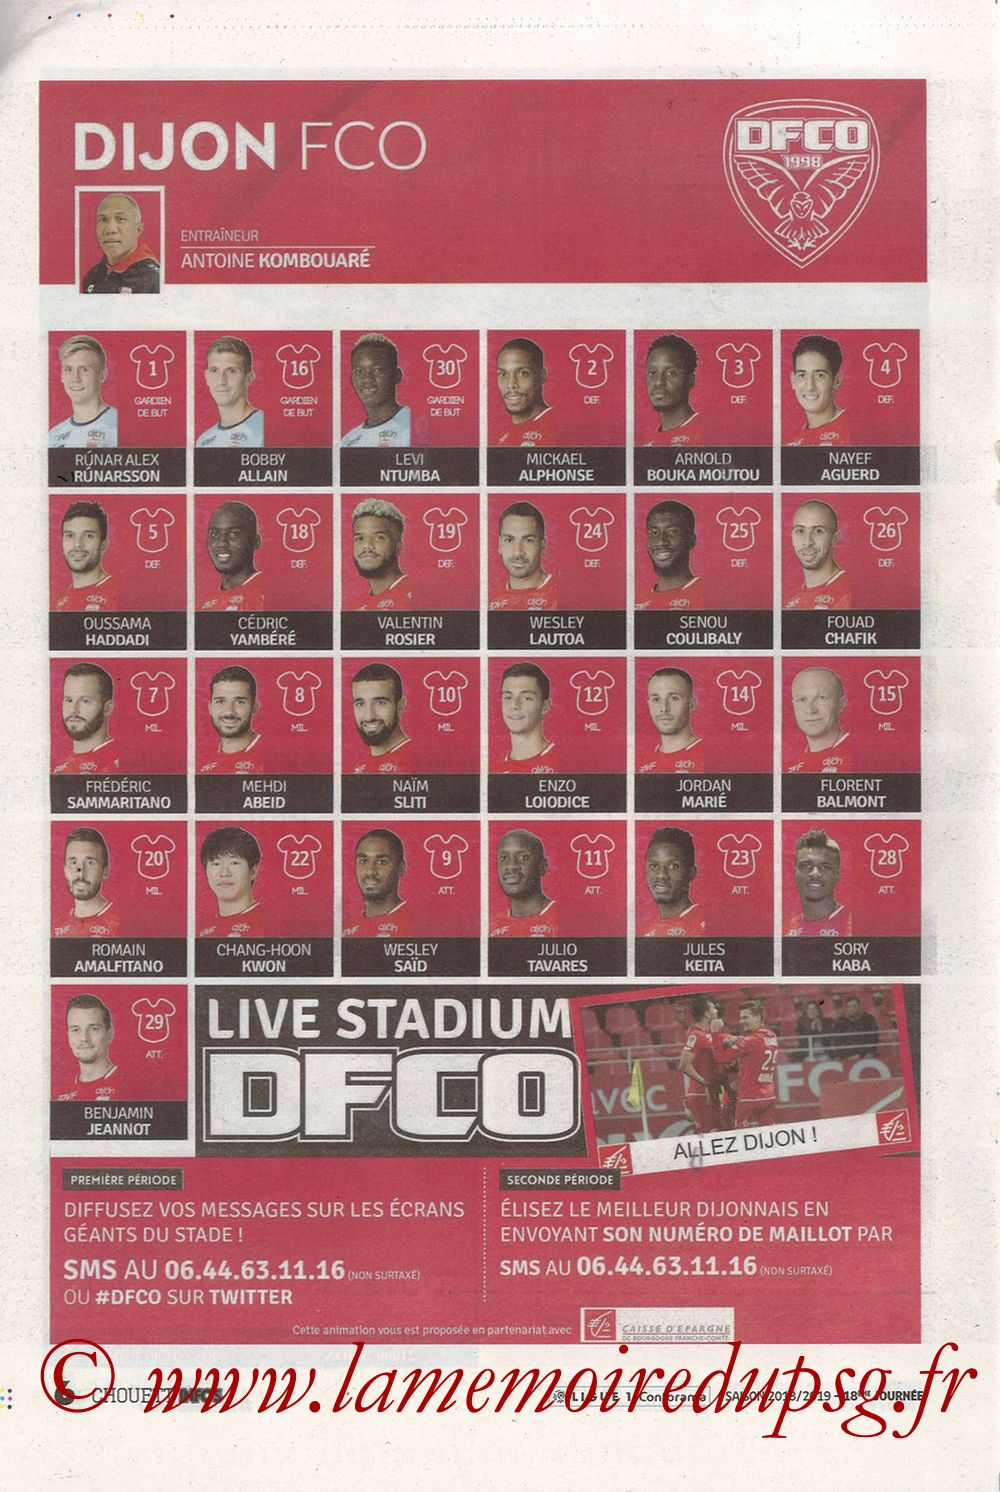 2019-03-12  Dijon-PSG (18ème L1 en retard, Chouett'Infos) - Page 06